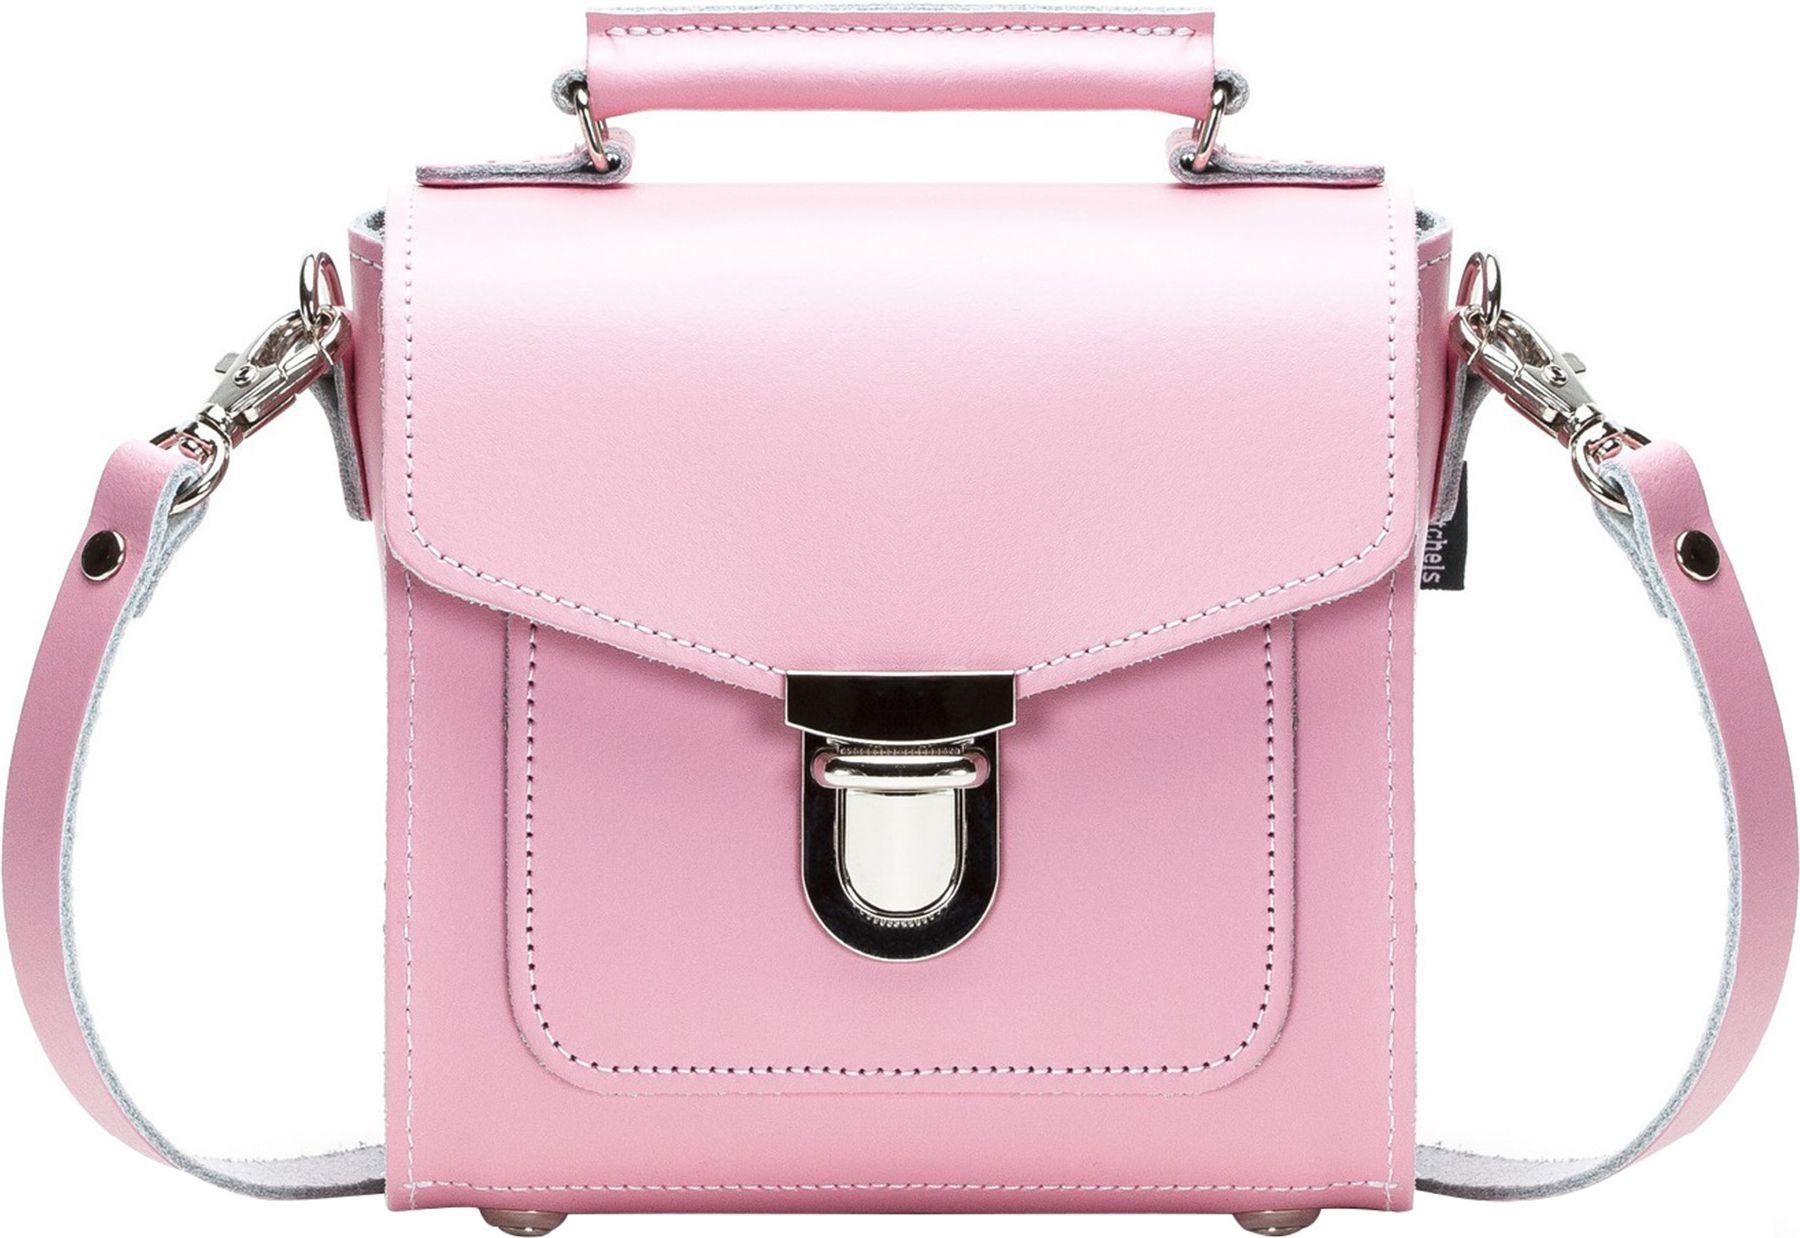 62aab0378dcf Zatchels Women's Handcrafted Pastel Leather Sugarcube Bag (British ...